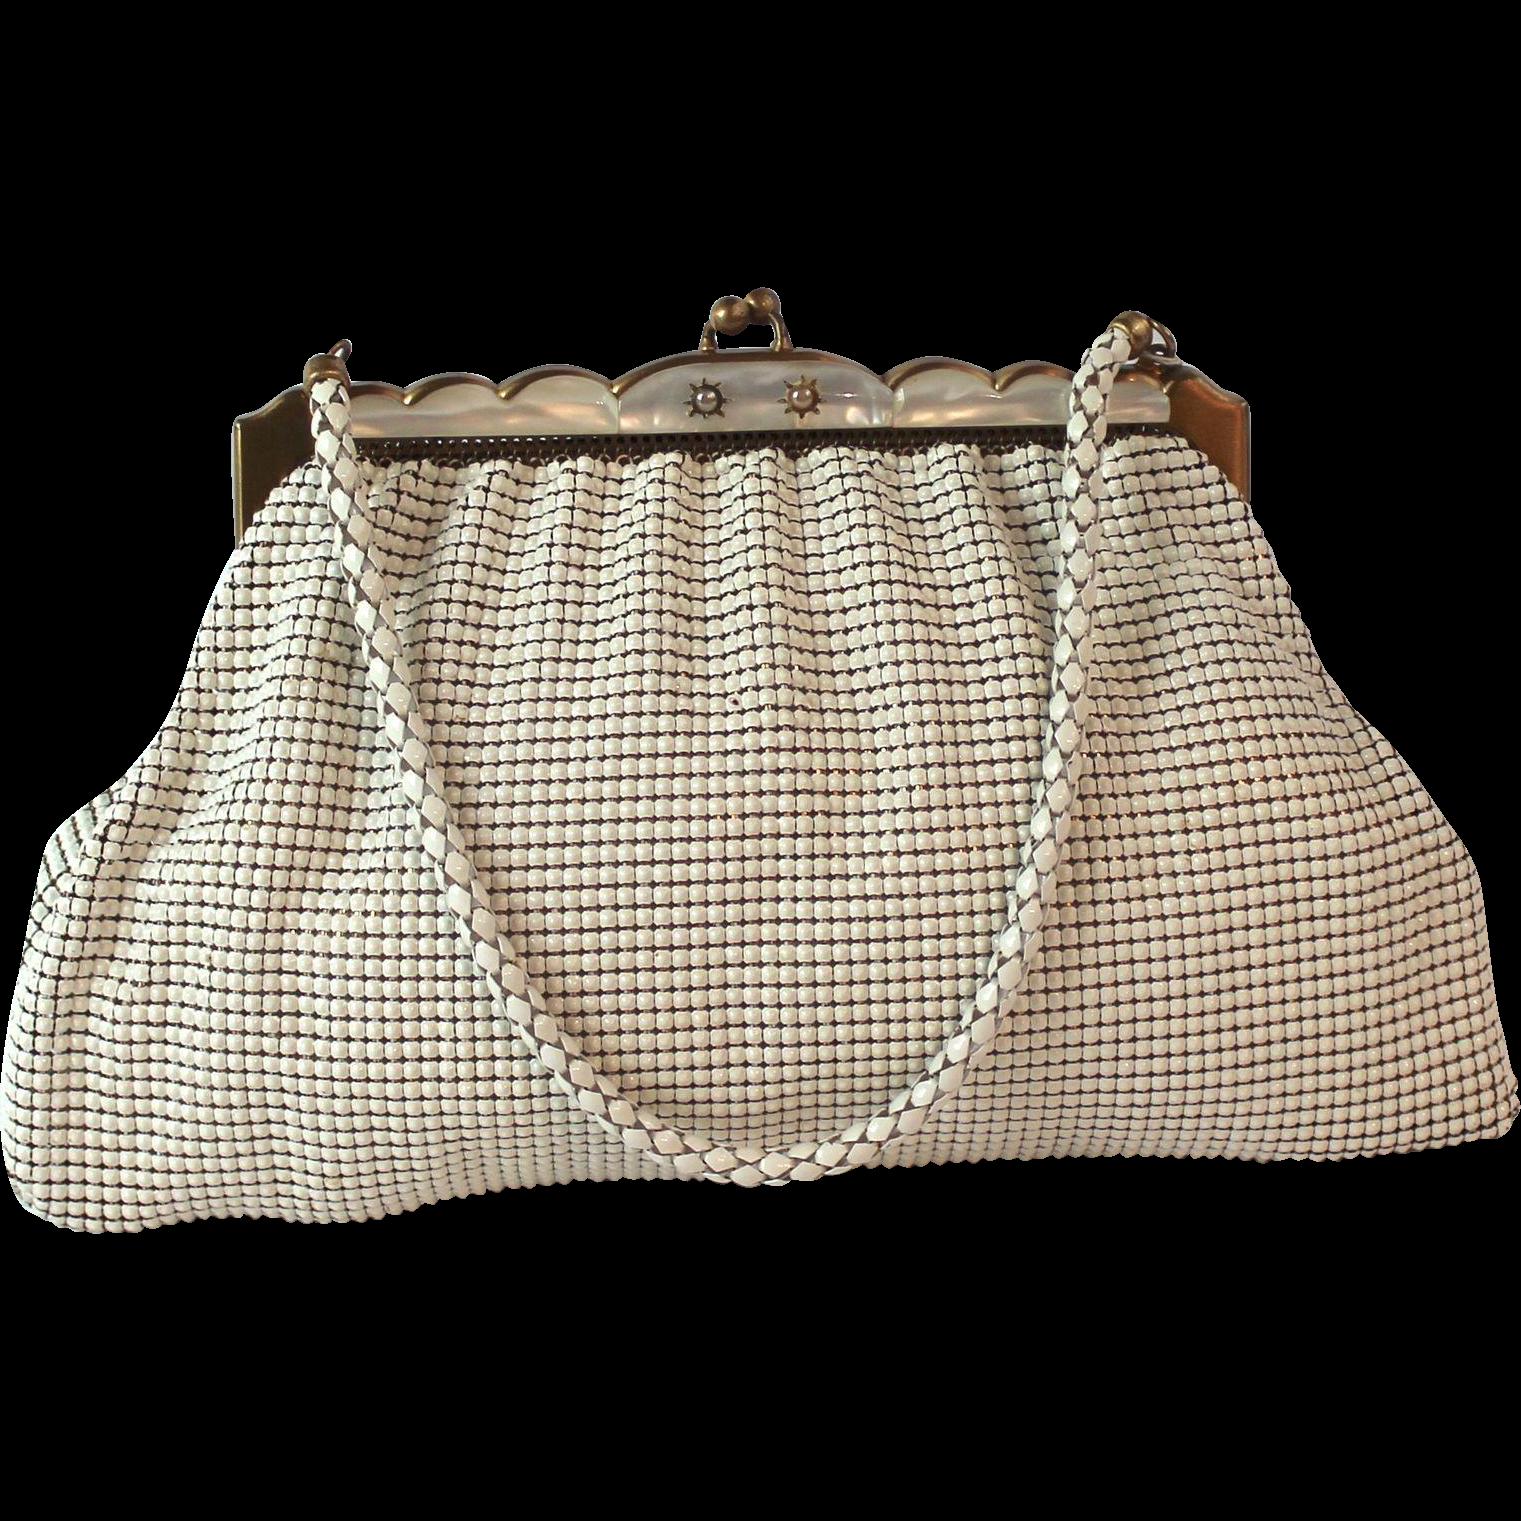 Vintage Whiting and Davis White Mesh Handbag